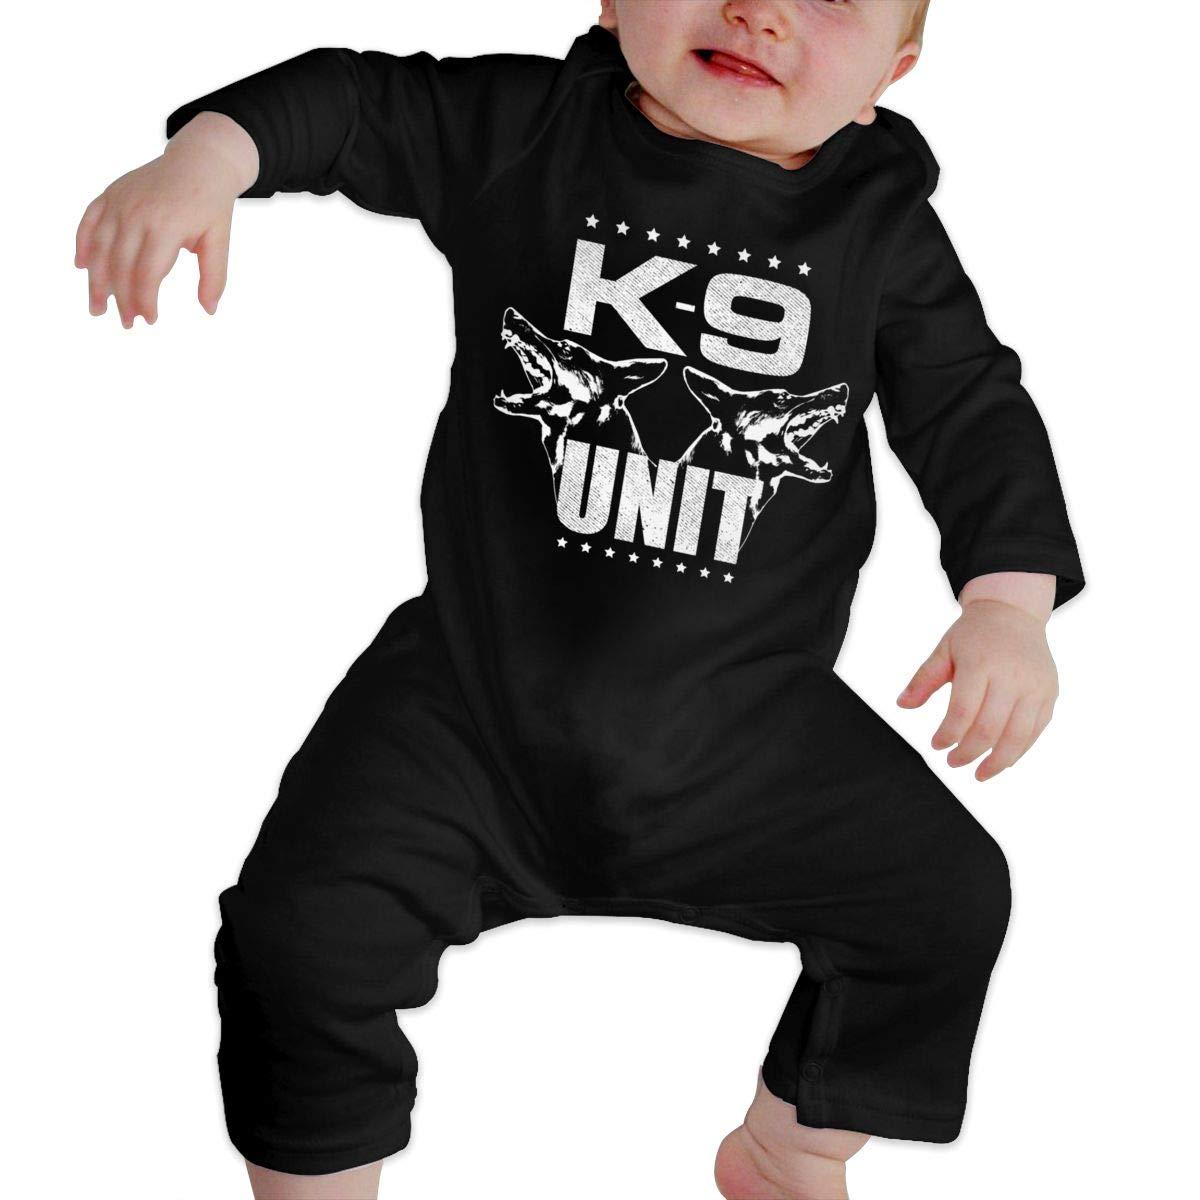 K-9 Unit Baby Long Sleeve Bodysuit Cotton Romper